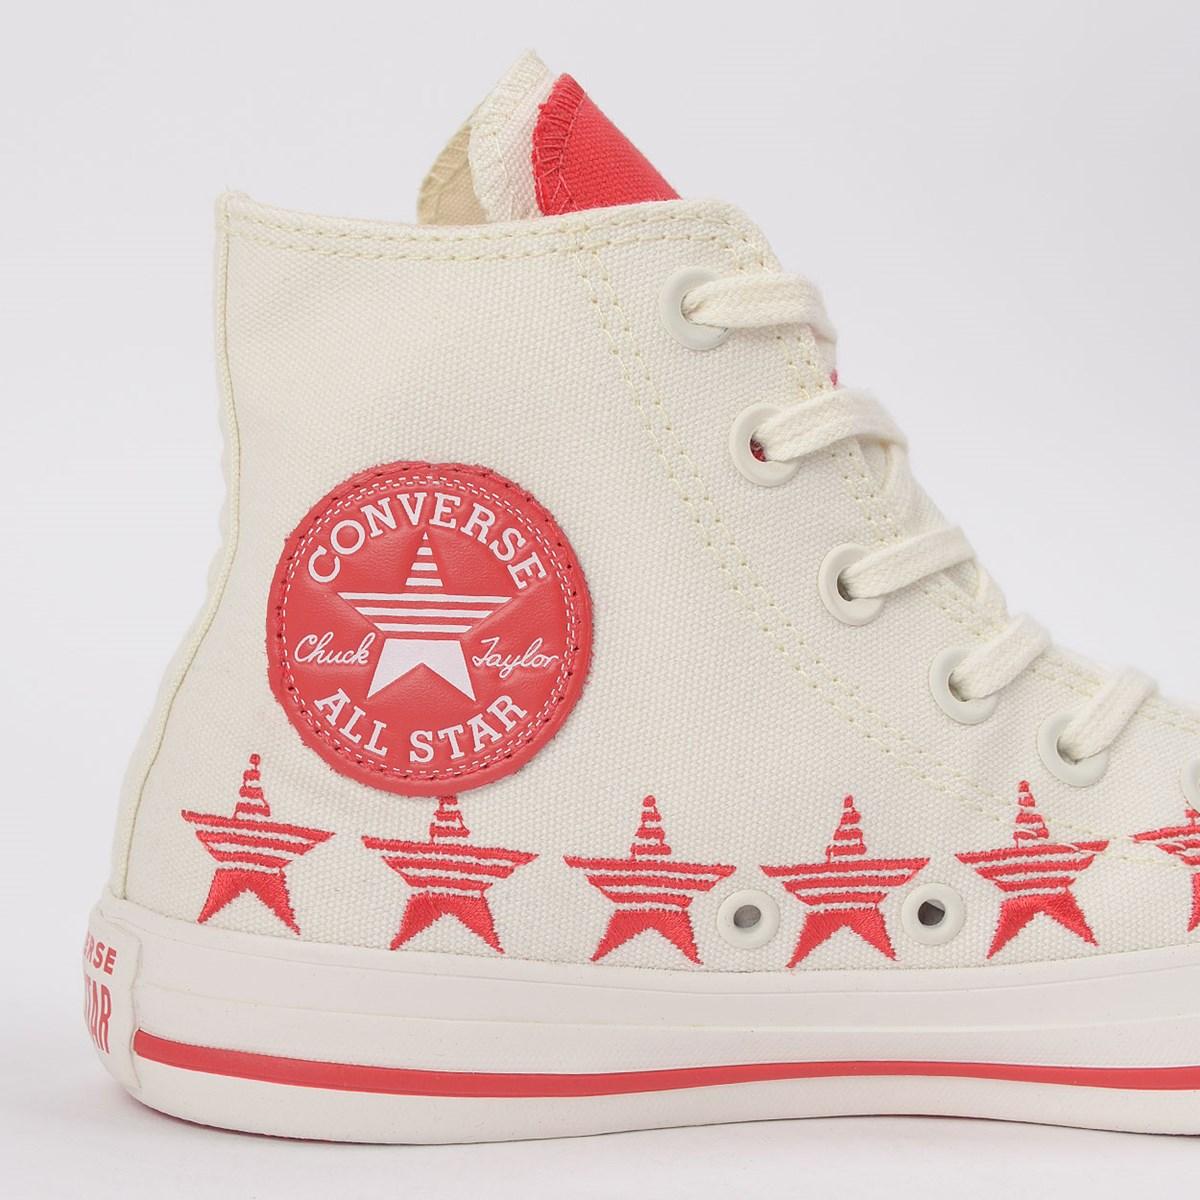 Tênis Converse Chuck Taylor All Star Hi Amendoa Vermelho CT14770002